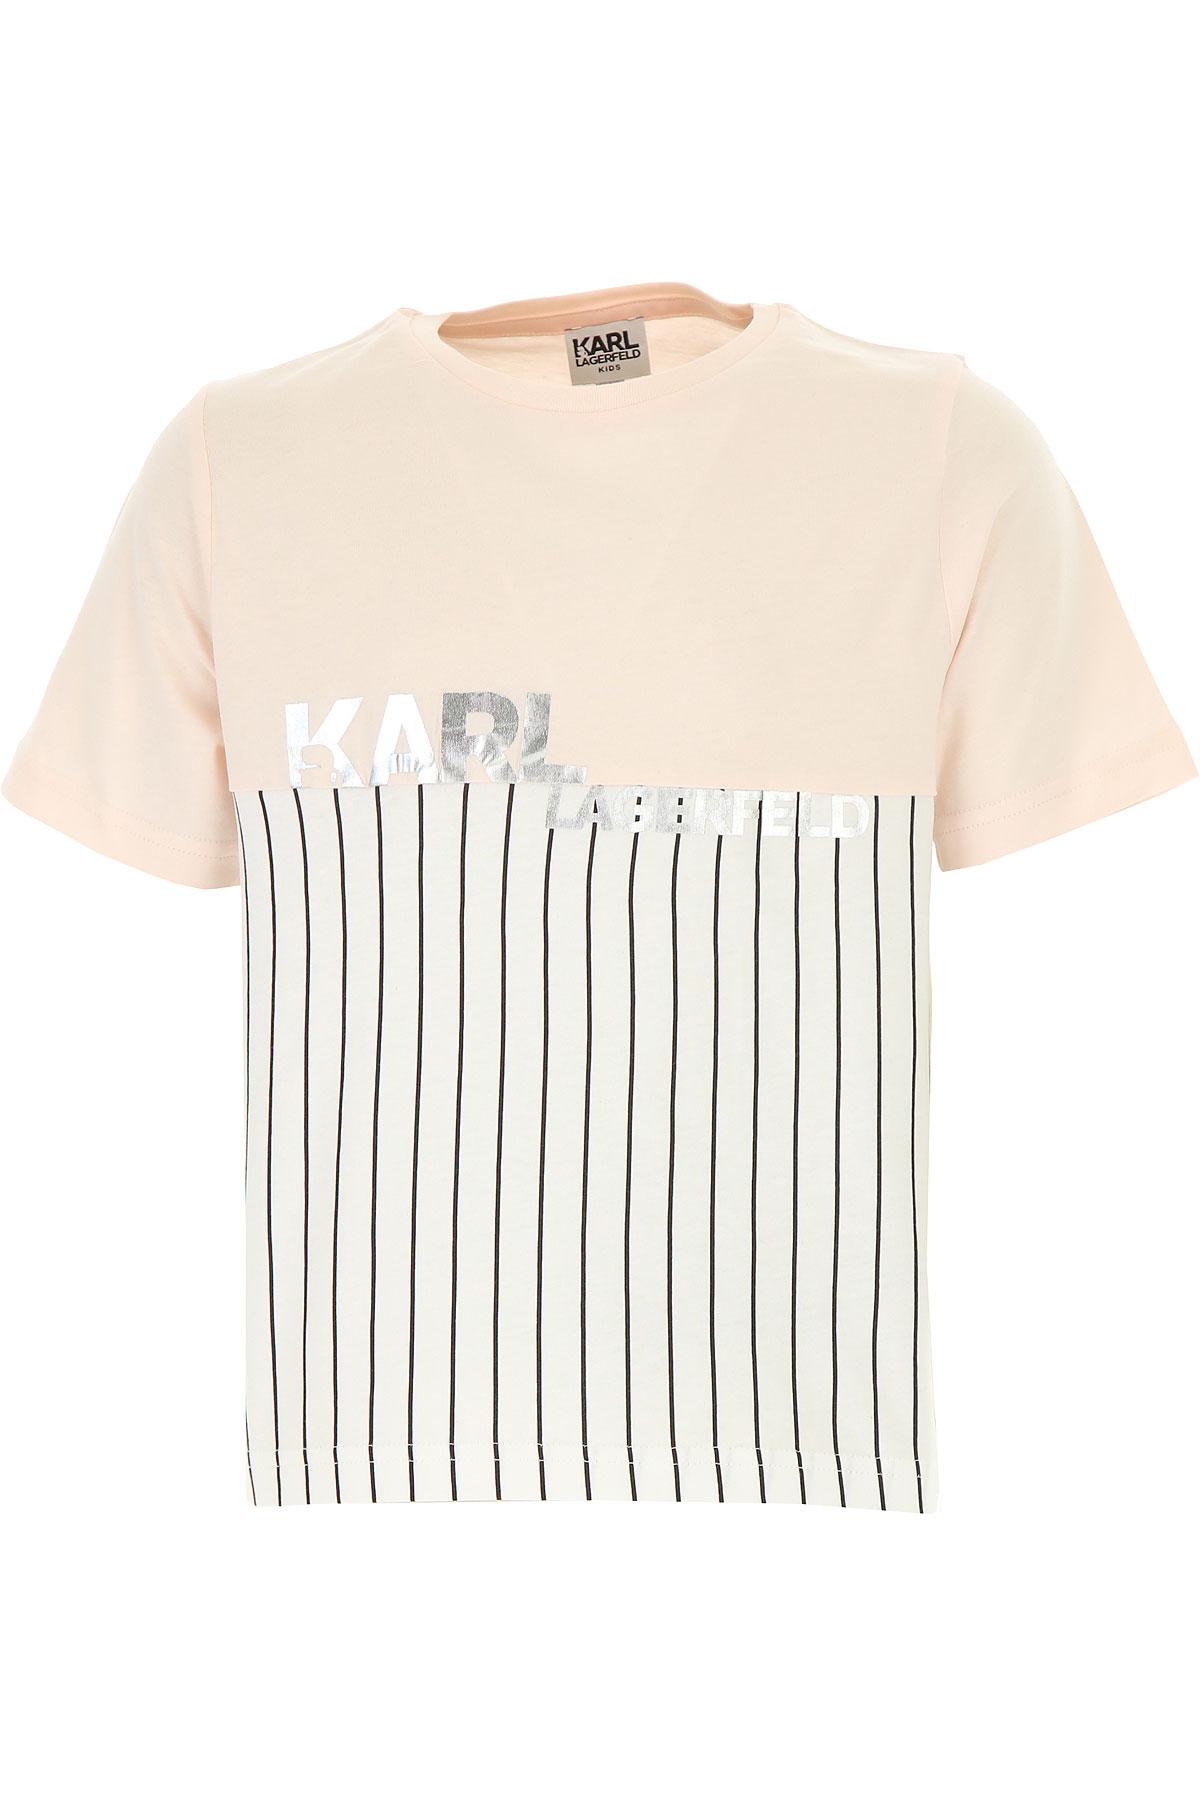 40acfc65b Pink, Spring - Summer 2019, Creased Cuffs, Short Sleeves, Karl ...